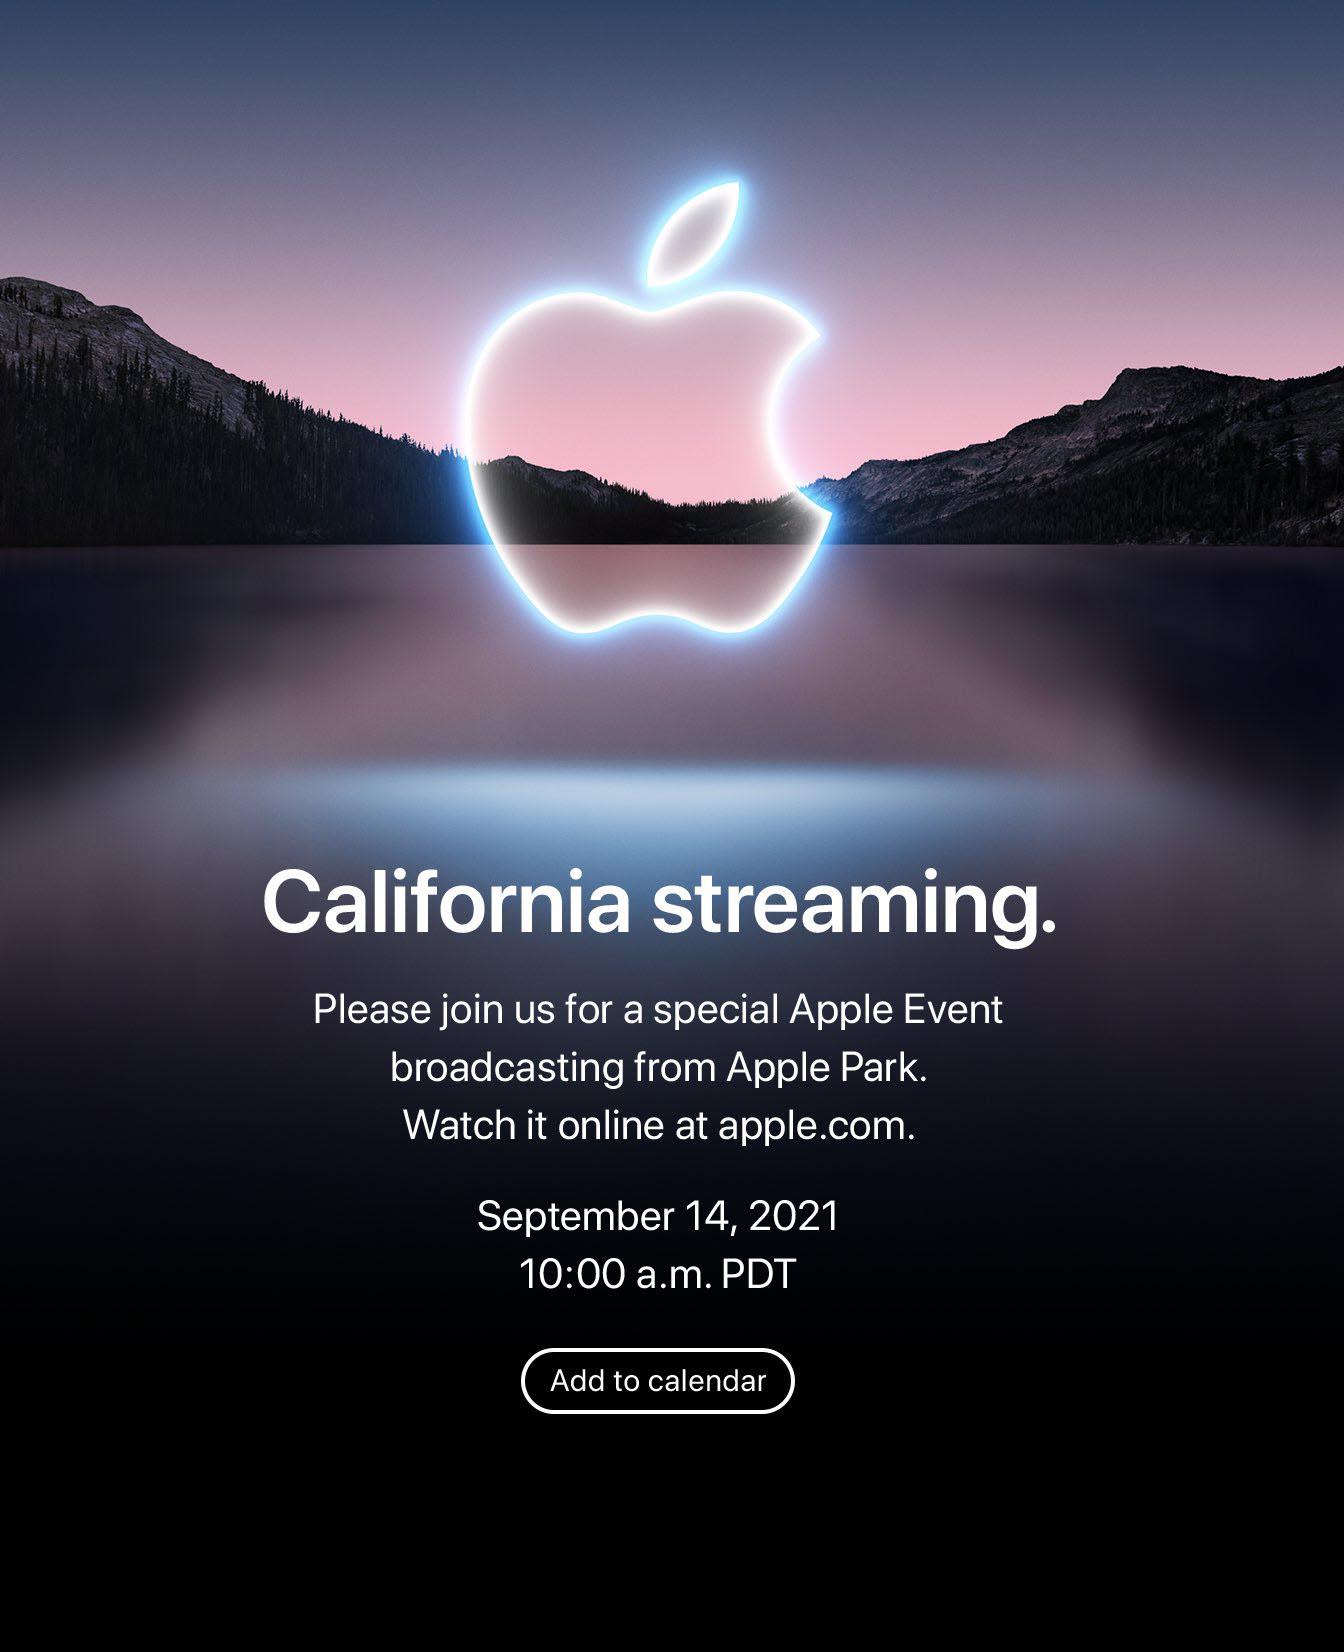 Apple Event California Streaming 14 septembre 2021